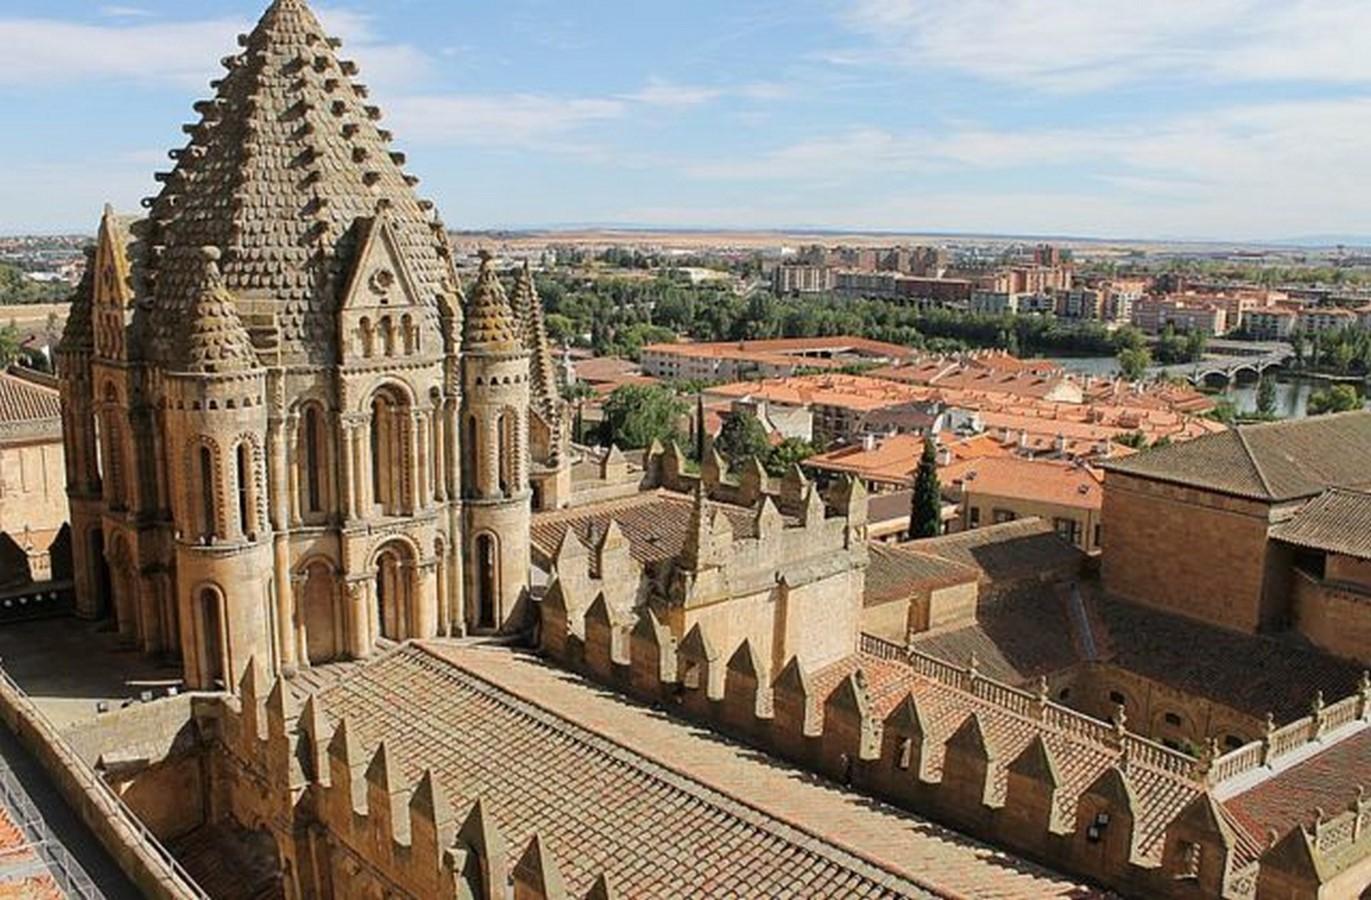 The New Cathedral of Salamanca - Sheet1